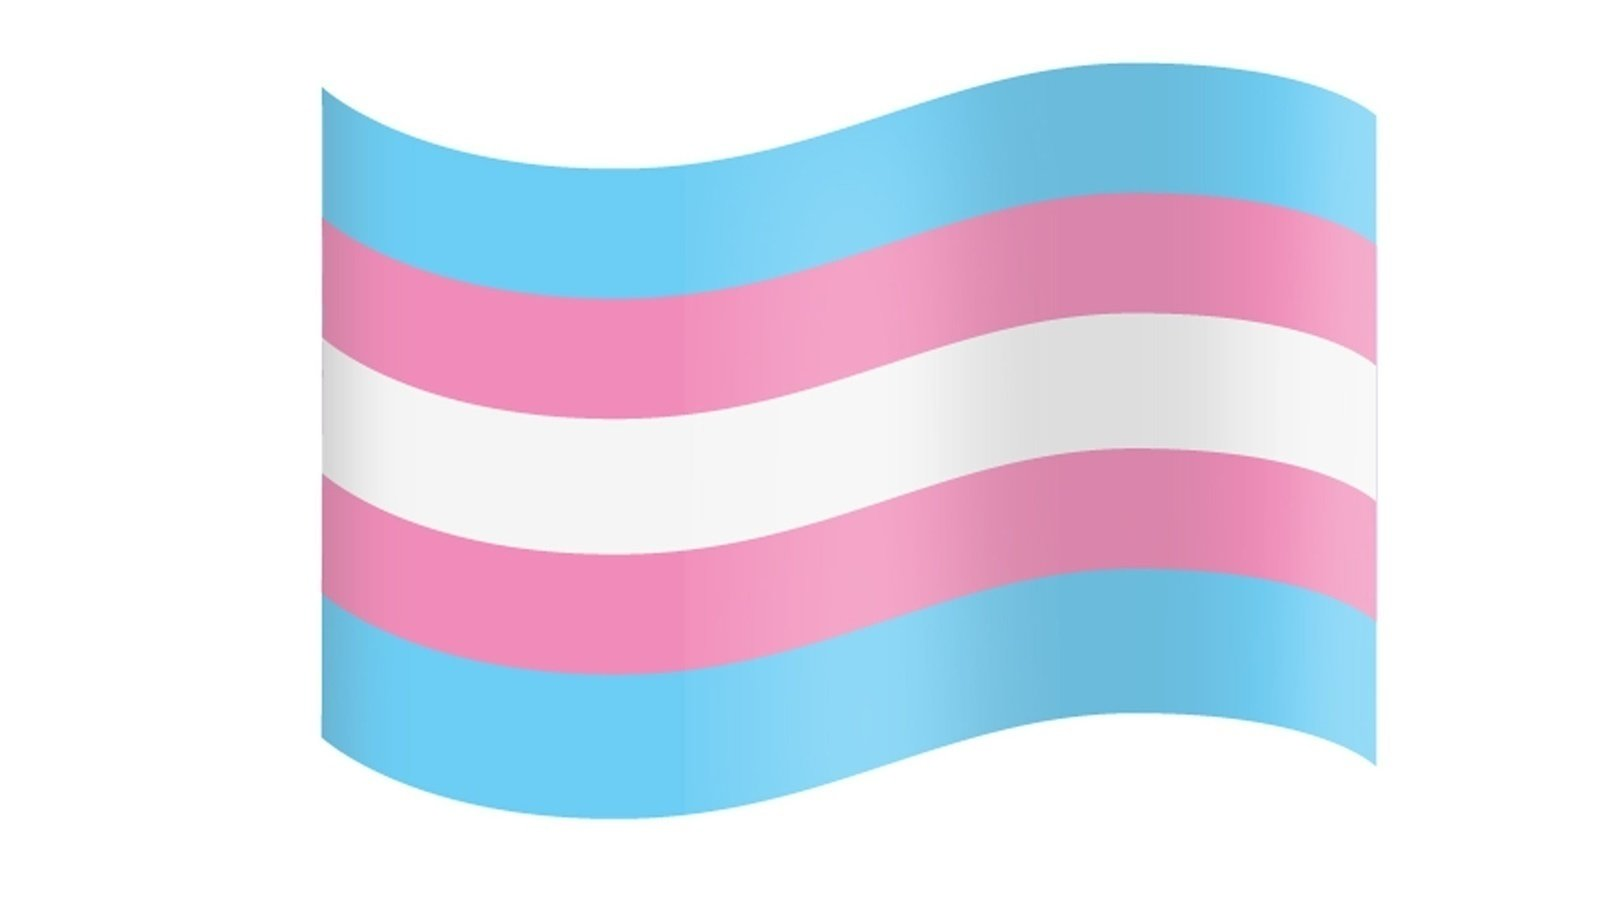 petition · apple should add the trans flag emoji · change